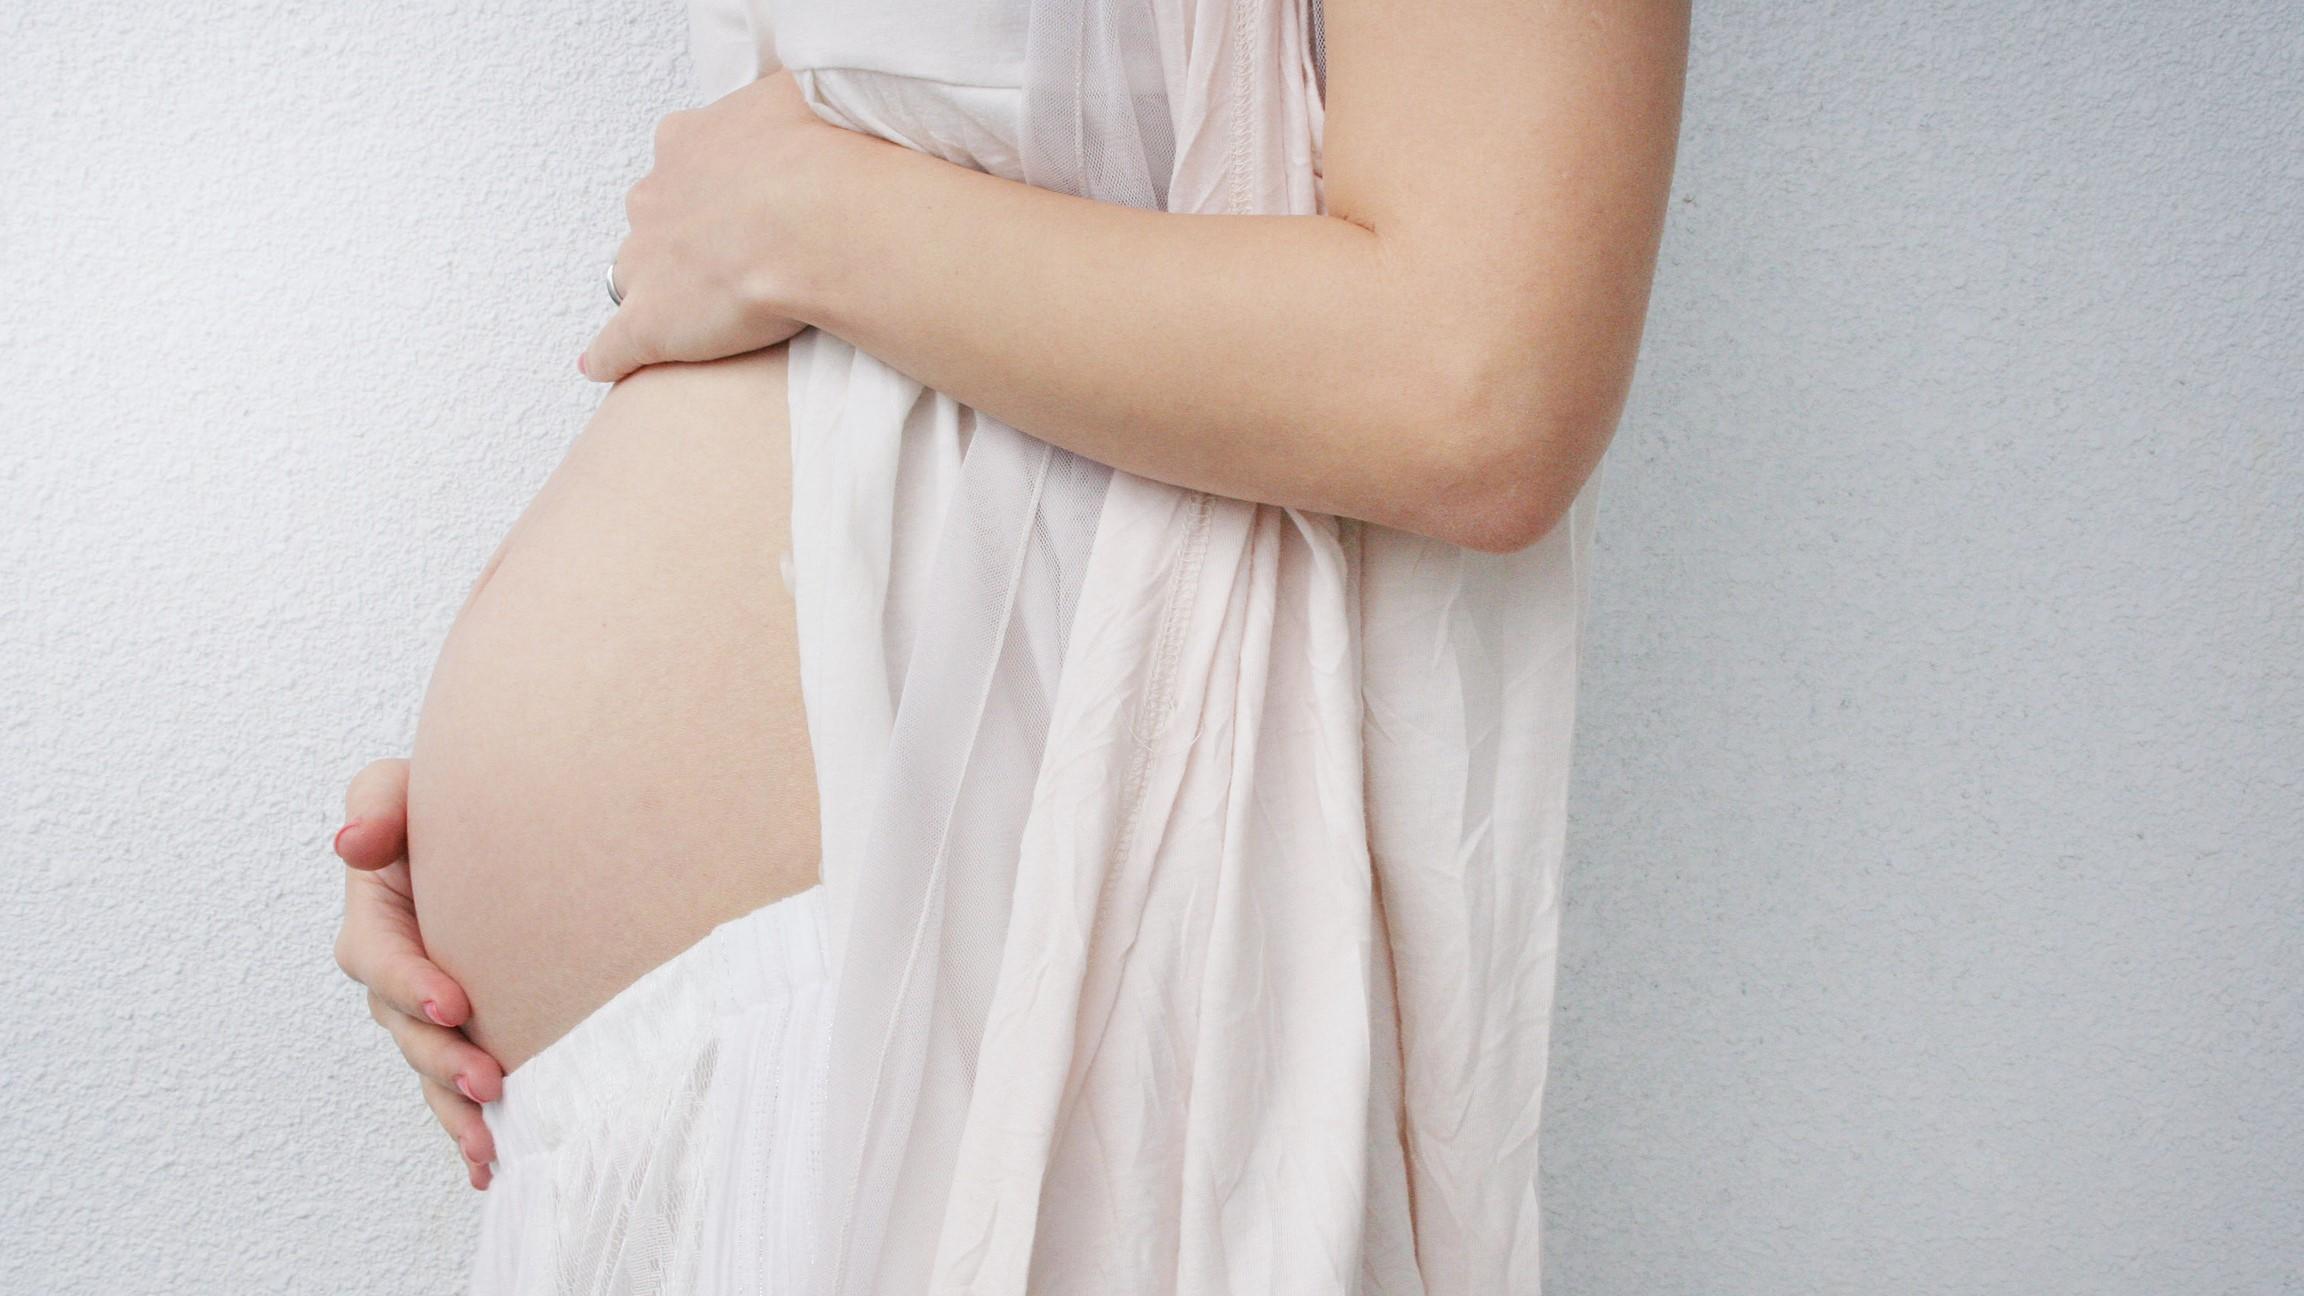 pregnancylinecare